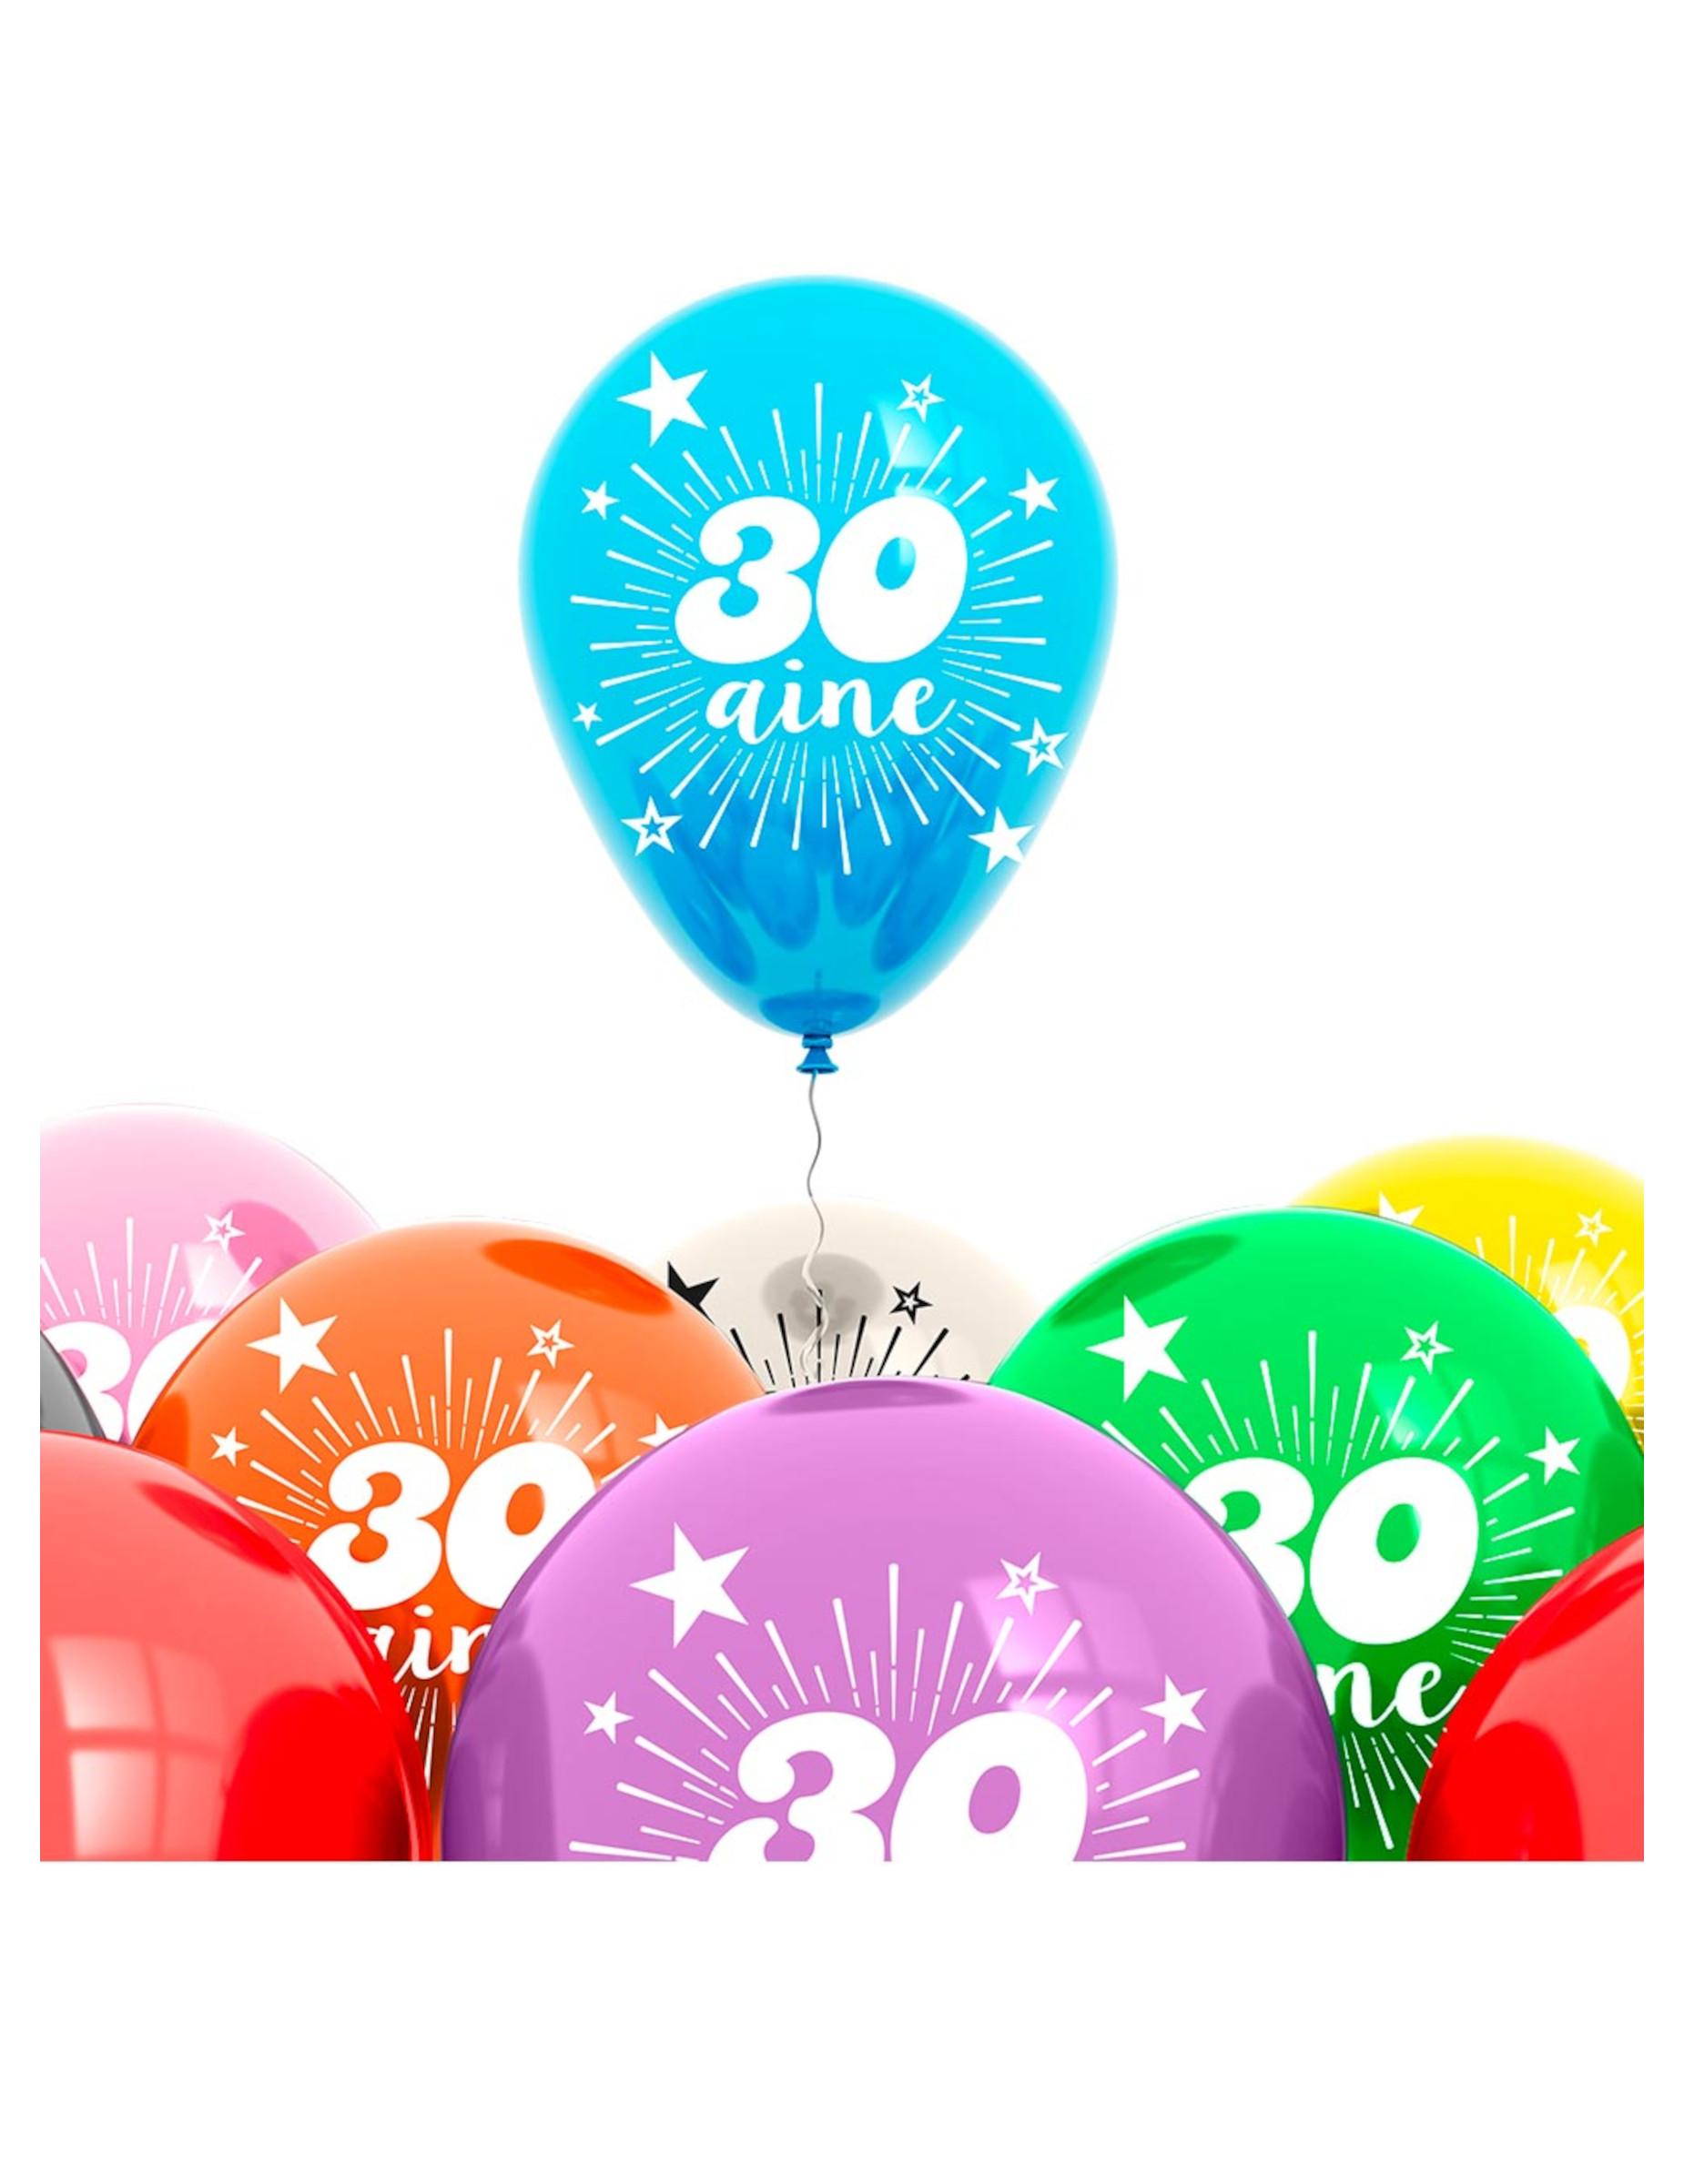 ballonnen 30 jaar Zak 8 ballonnen 30 jaar: Decoratie,en goedkope carnavalskleding  ballonnen 30 jaar